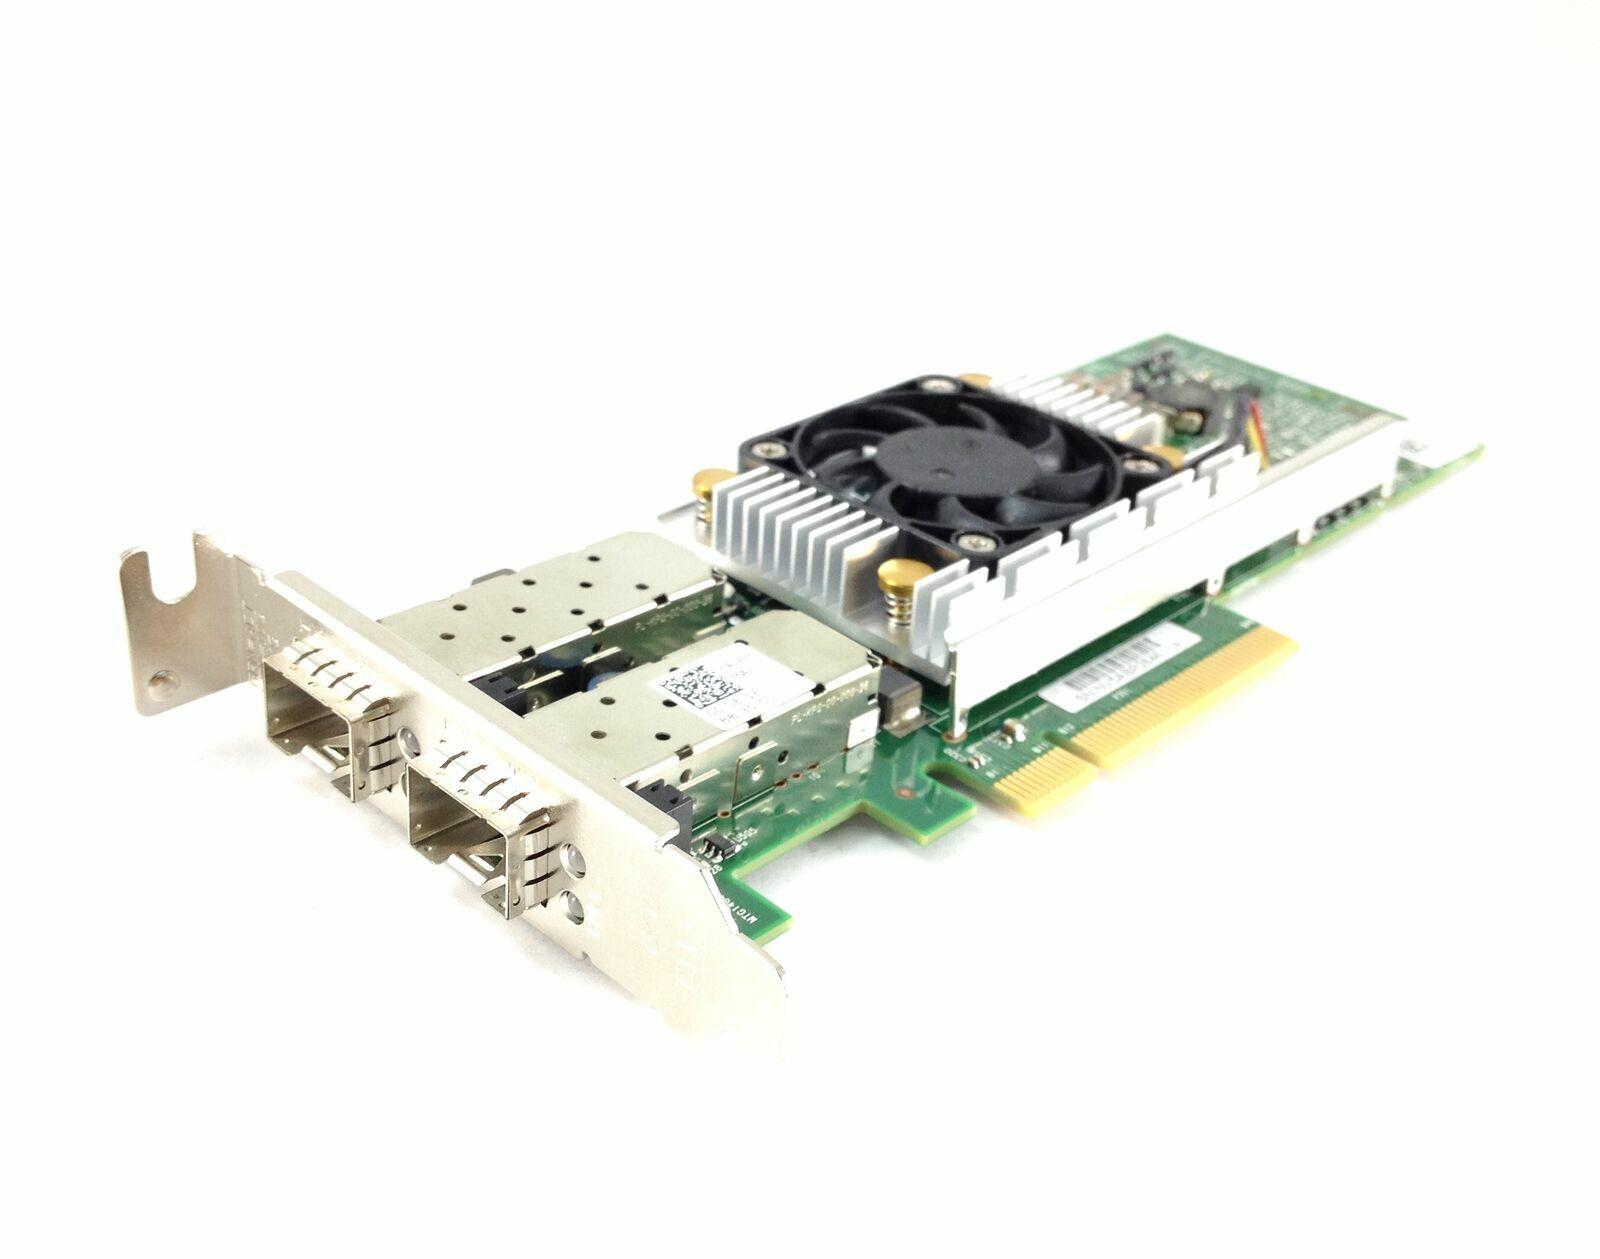 Dell Y40PH Broadcom 57810S Dual Port 10GbE SFP+ Network Low ProfileDell Y40PH